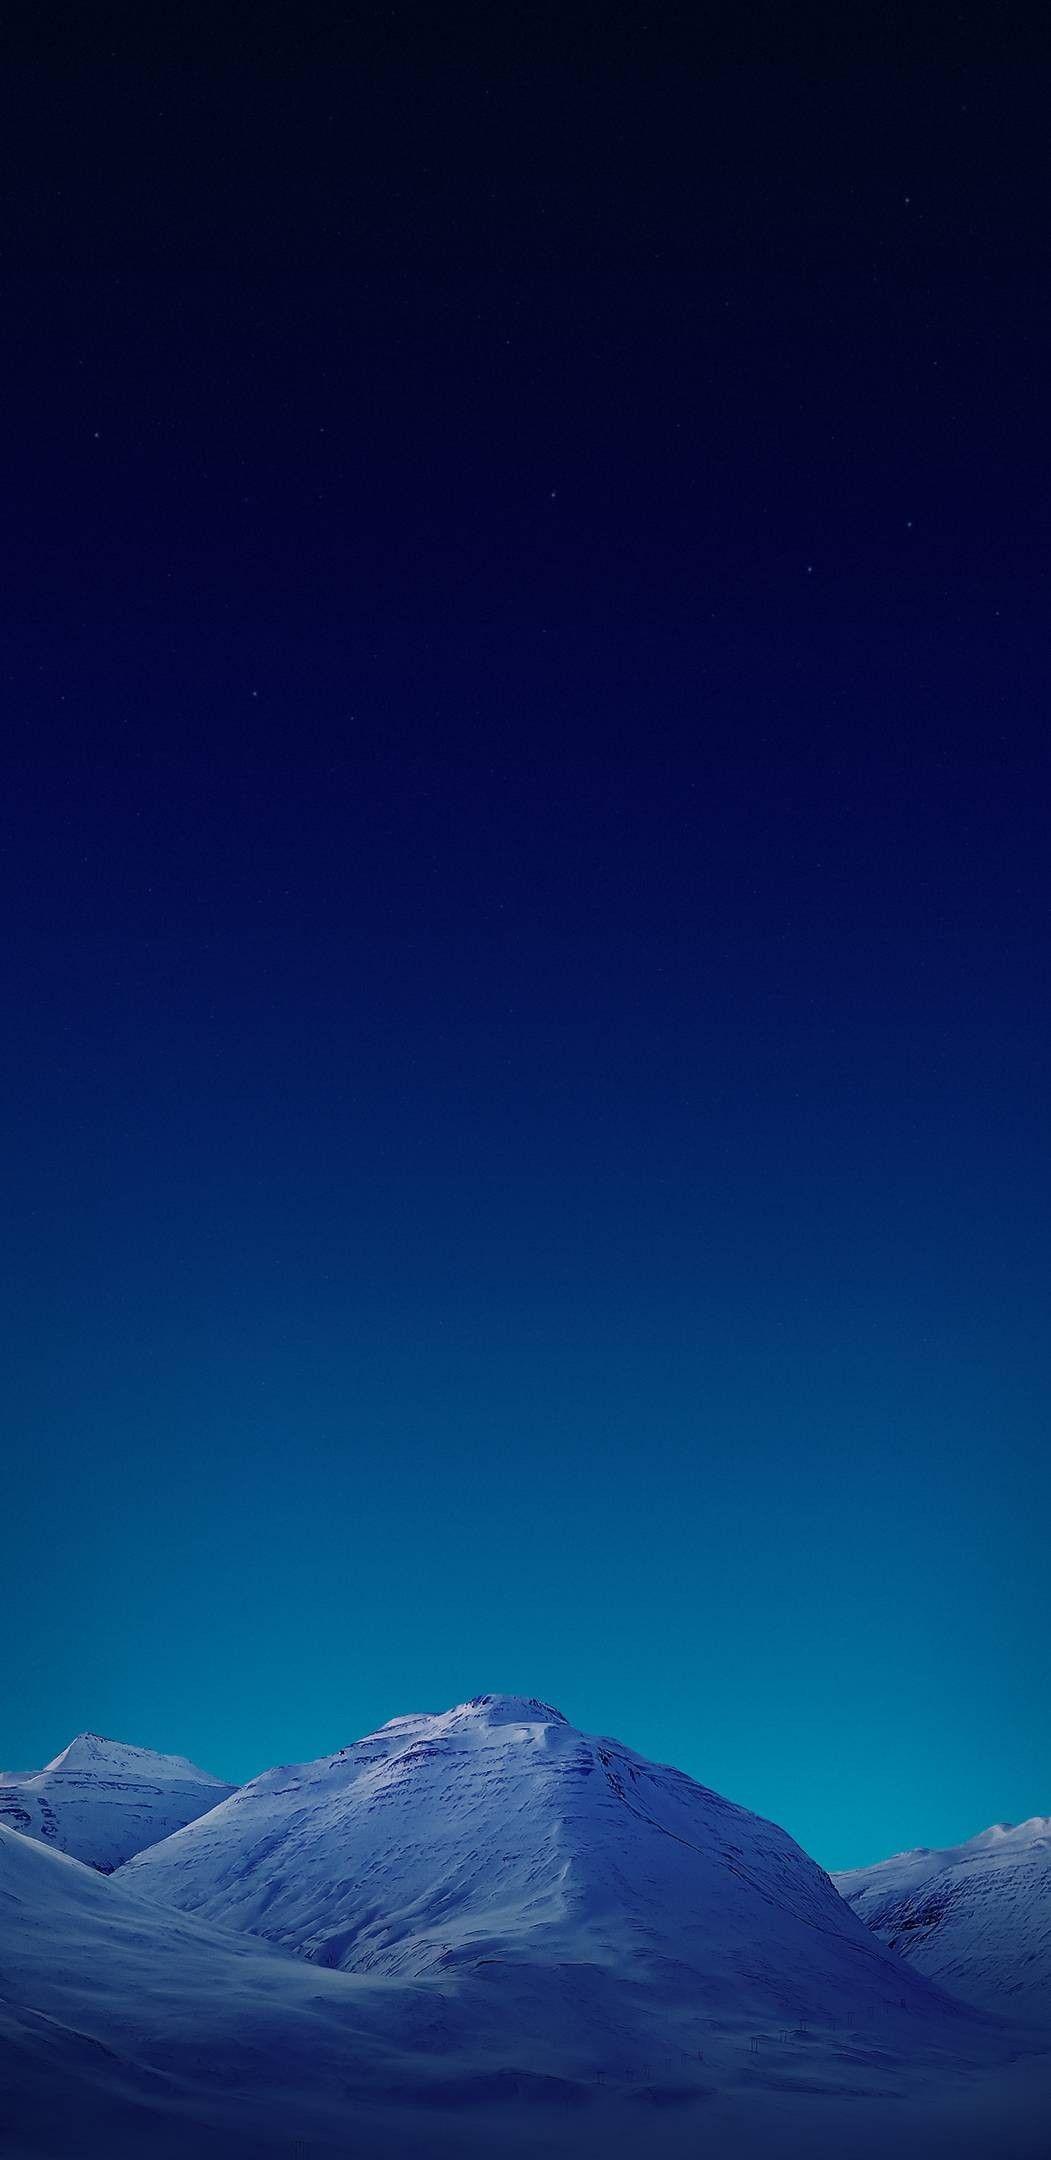 Night sky blue mountain wallpaper clean galaxy colour 1051x2160